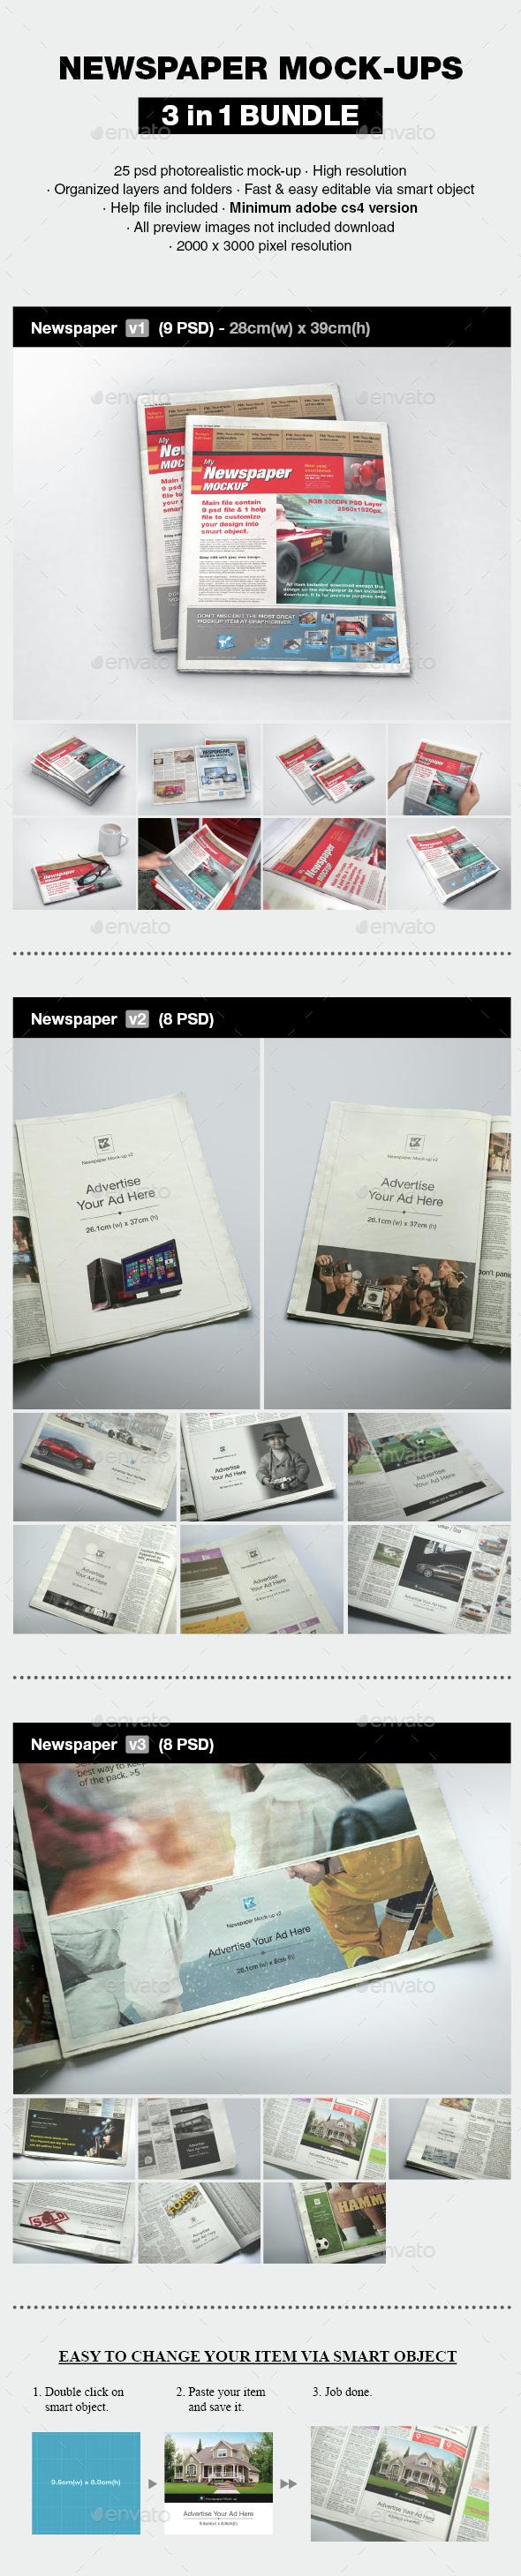 Newspaper Mock-up Bundle - Print Product Mock-Ups